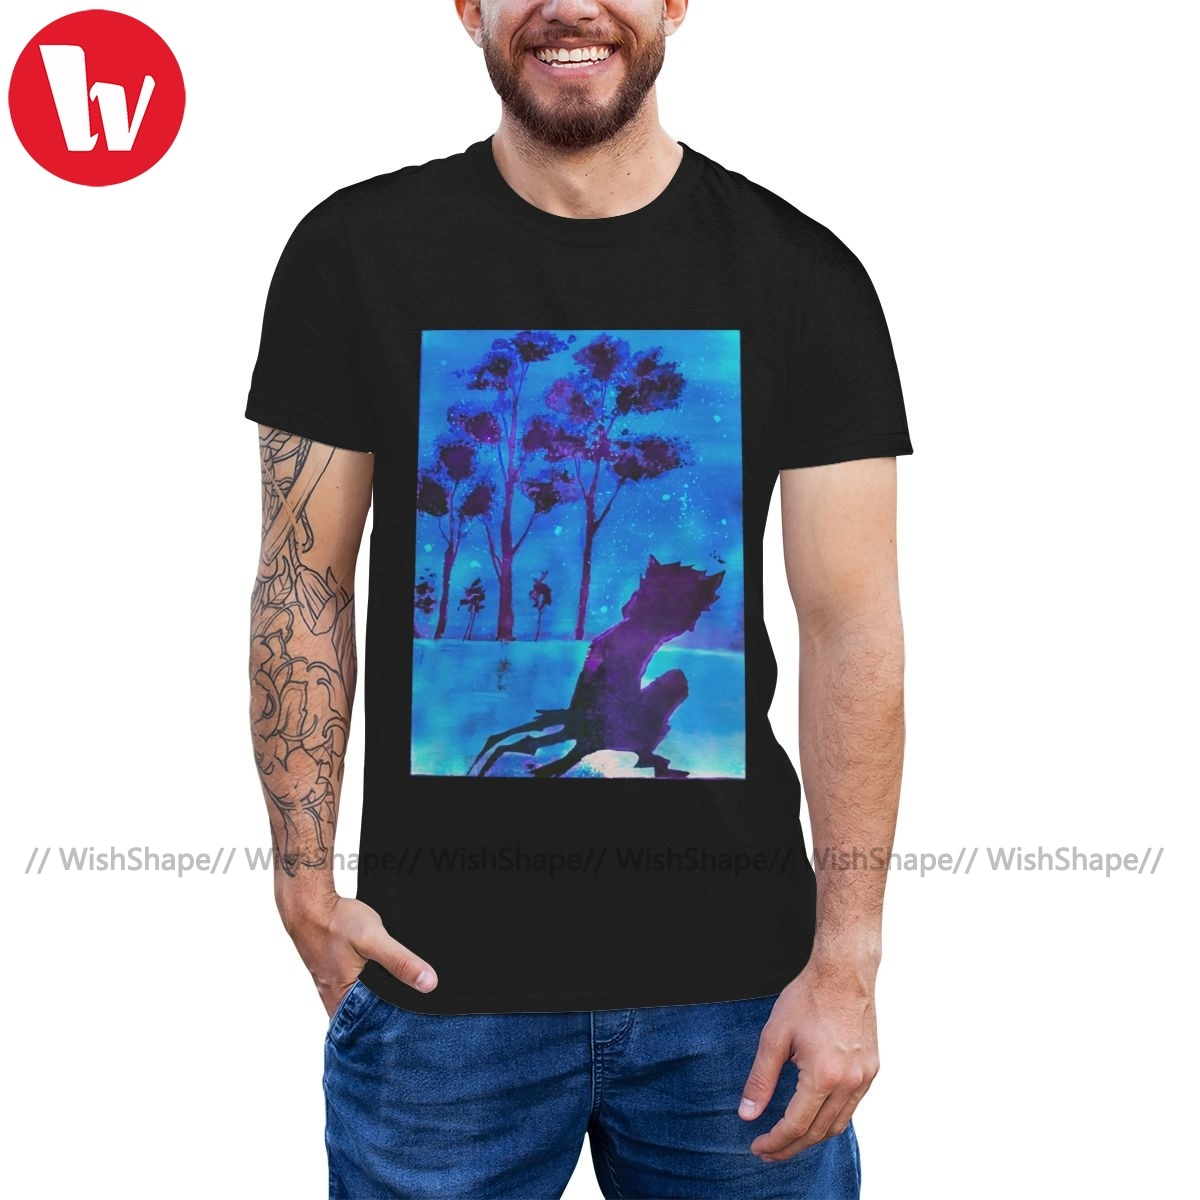 100 algodão streetwear camiseta masculina impressão bonito mais tamanho tshirt servoamp t camisa sakuya v lesu